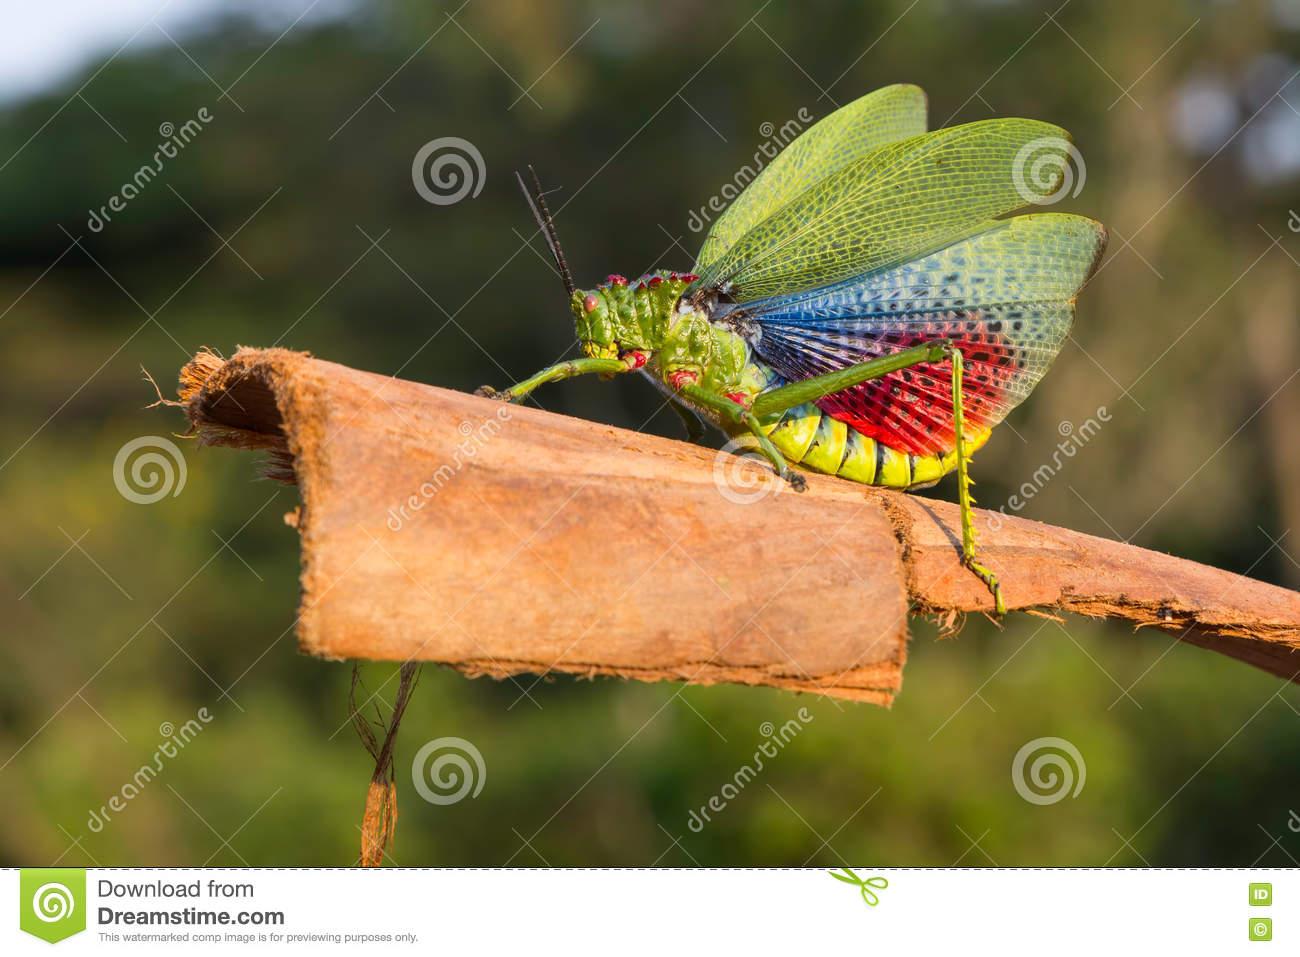 Green Milkwood Locust, Or African Bush Grasshopper Stock Photo.